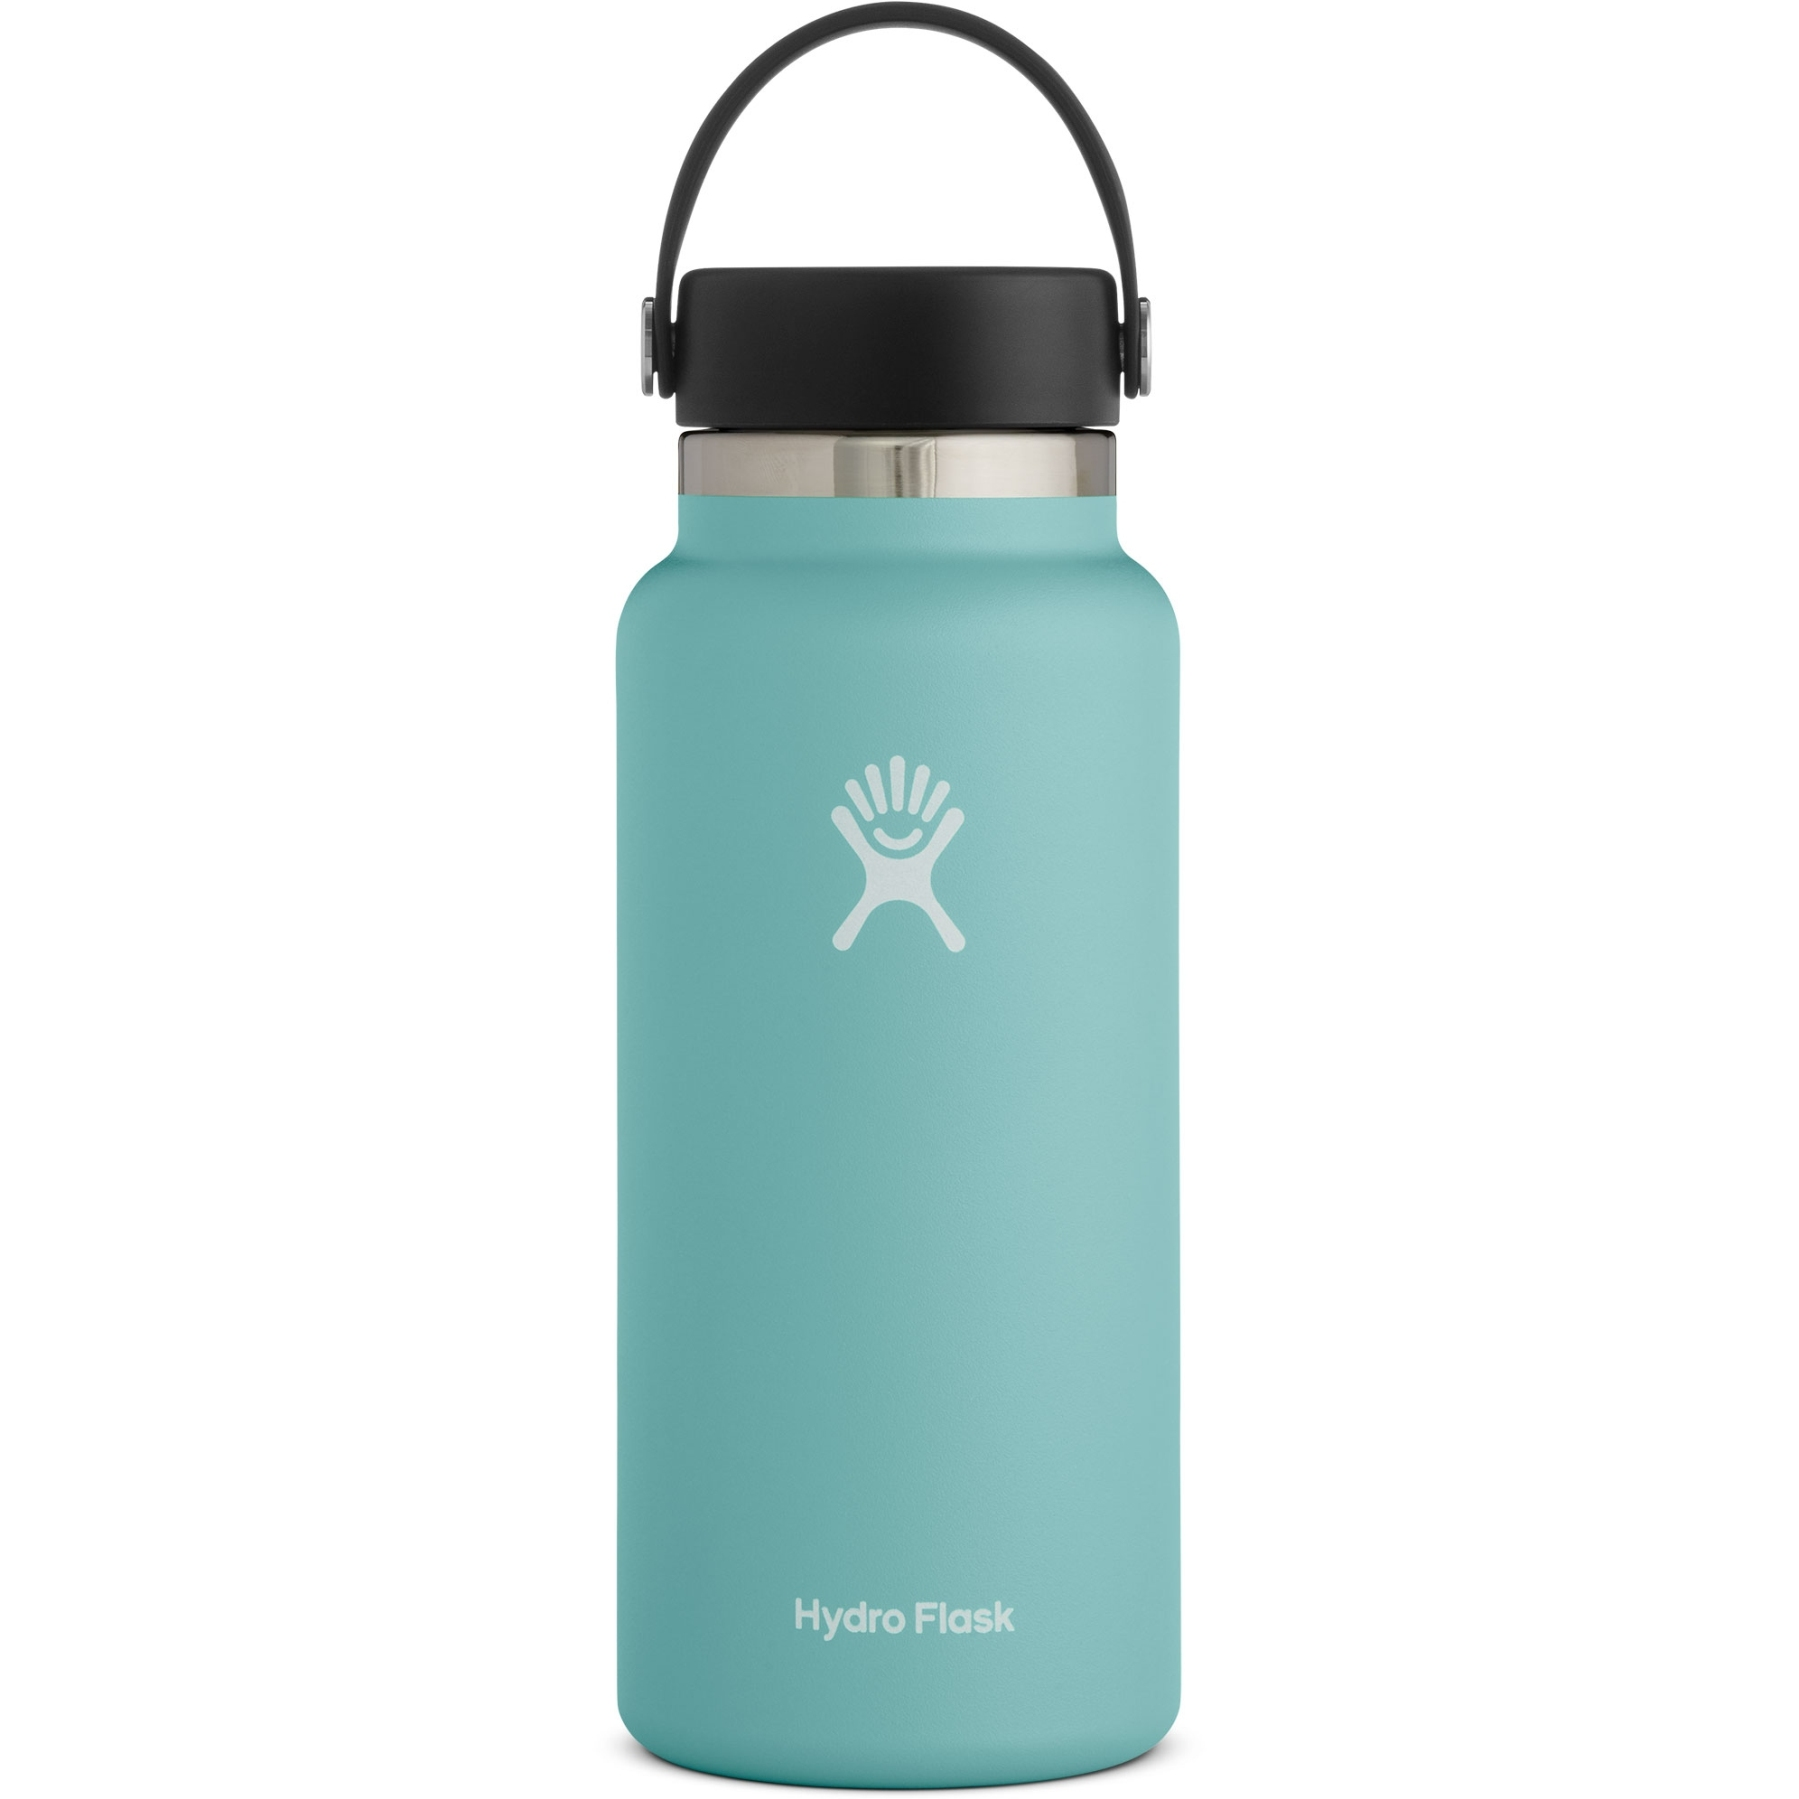 Hydro Flask 32 Oz Wide Mouth Flex Cap Thermoflasche - 946 ml - Alpine